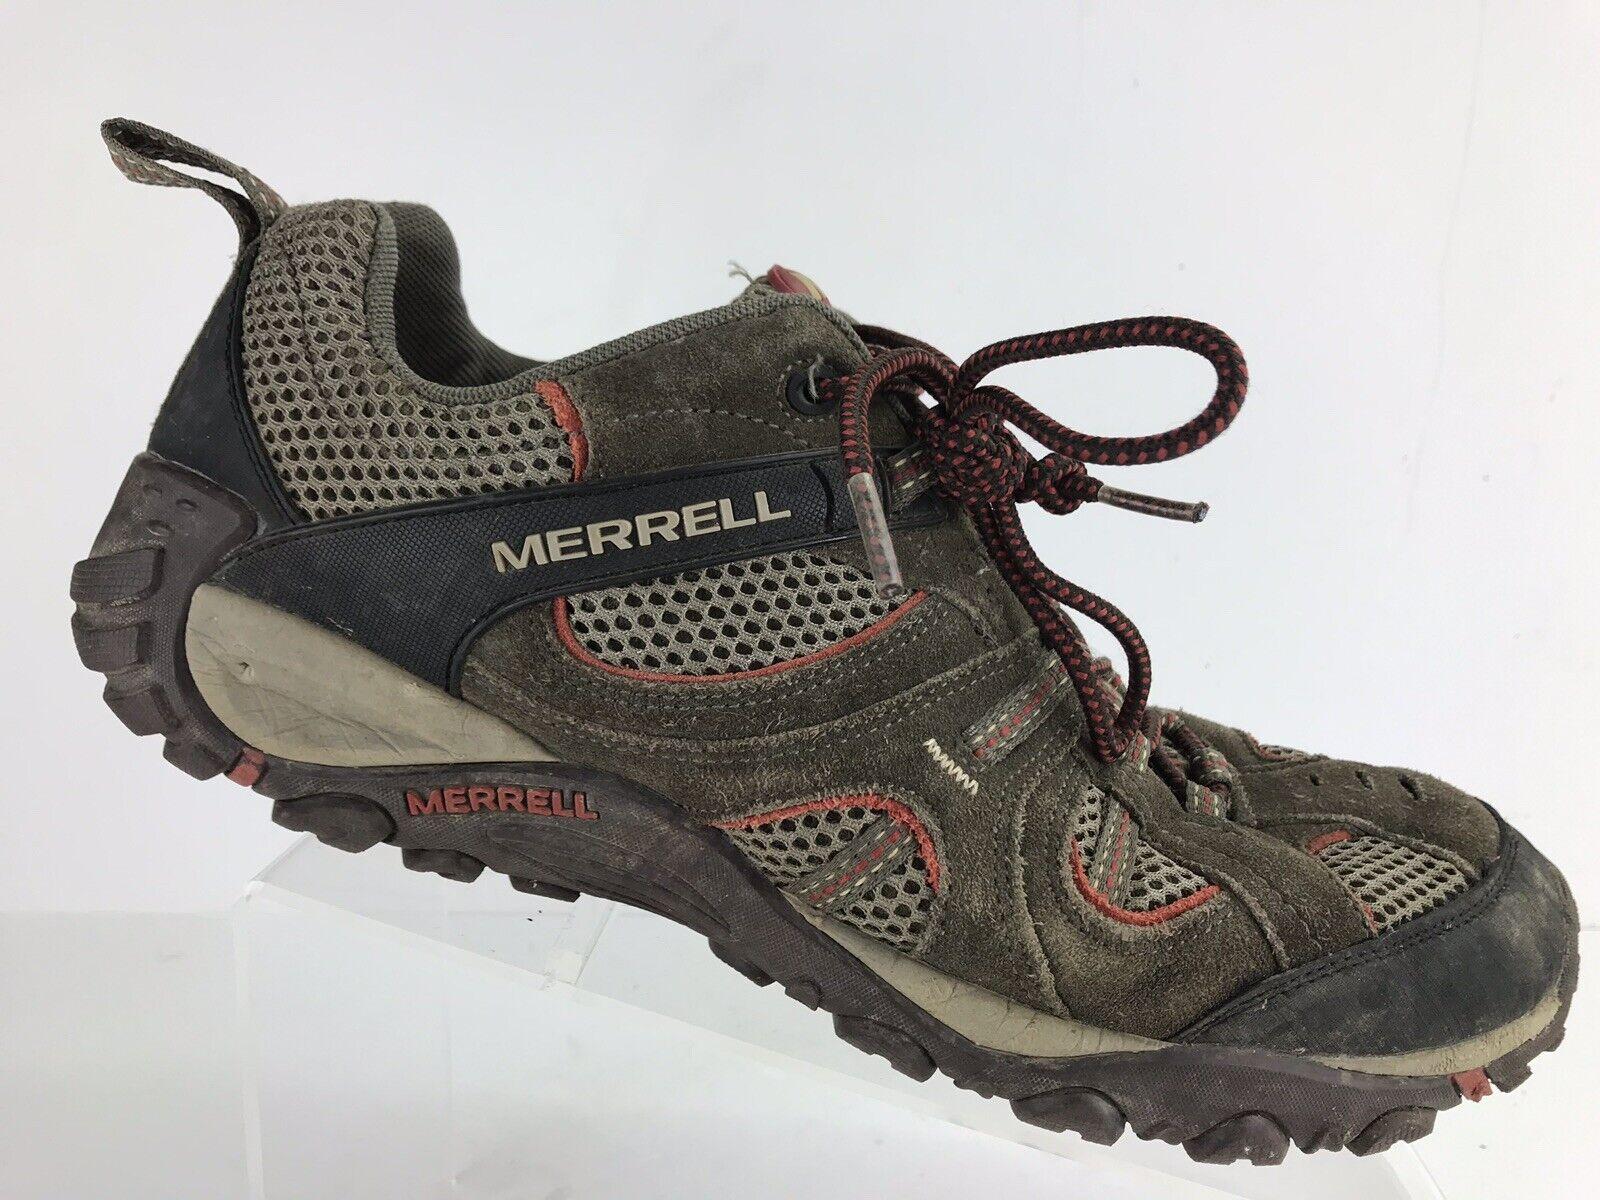 Merrell Mens Sz 12 Yokota Trail Vent Hiking shoes Bungee Cord red Ochre J148531c